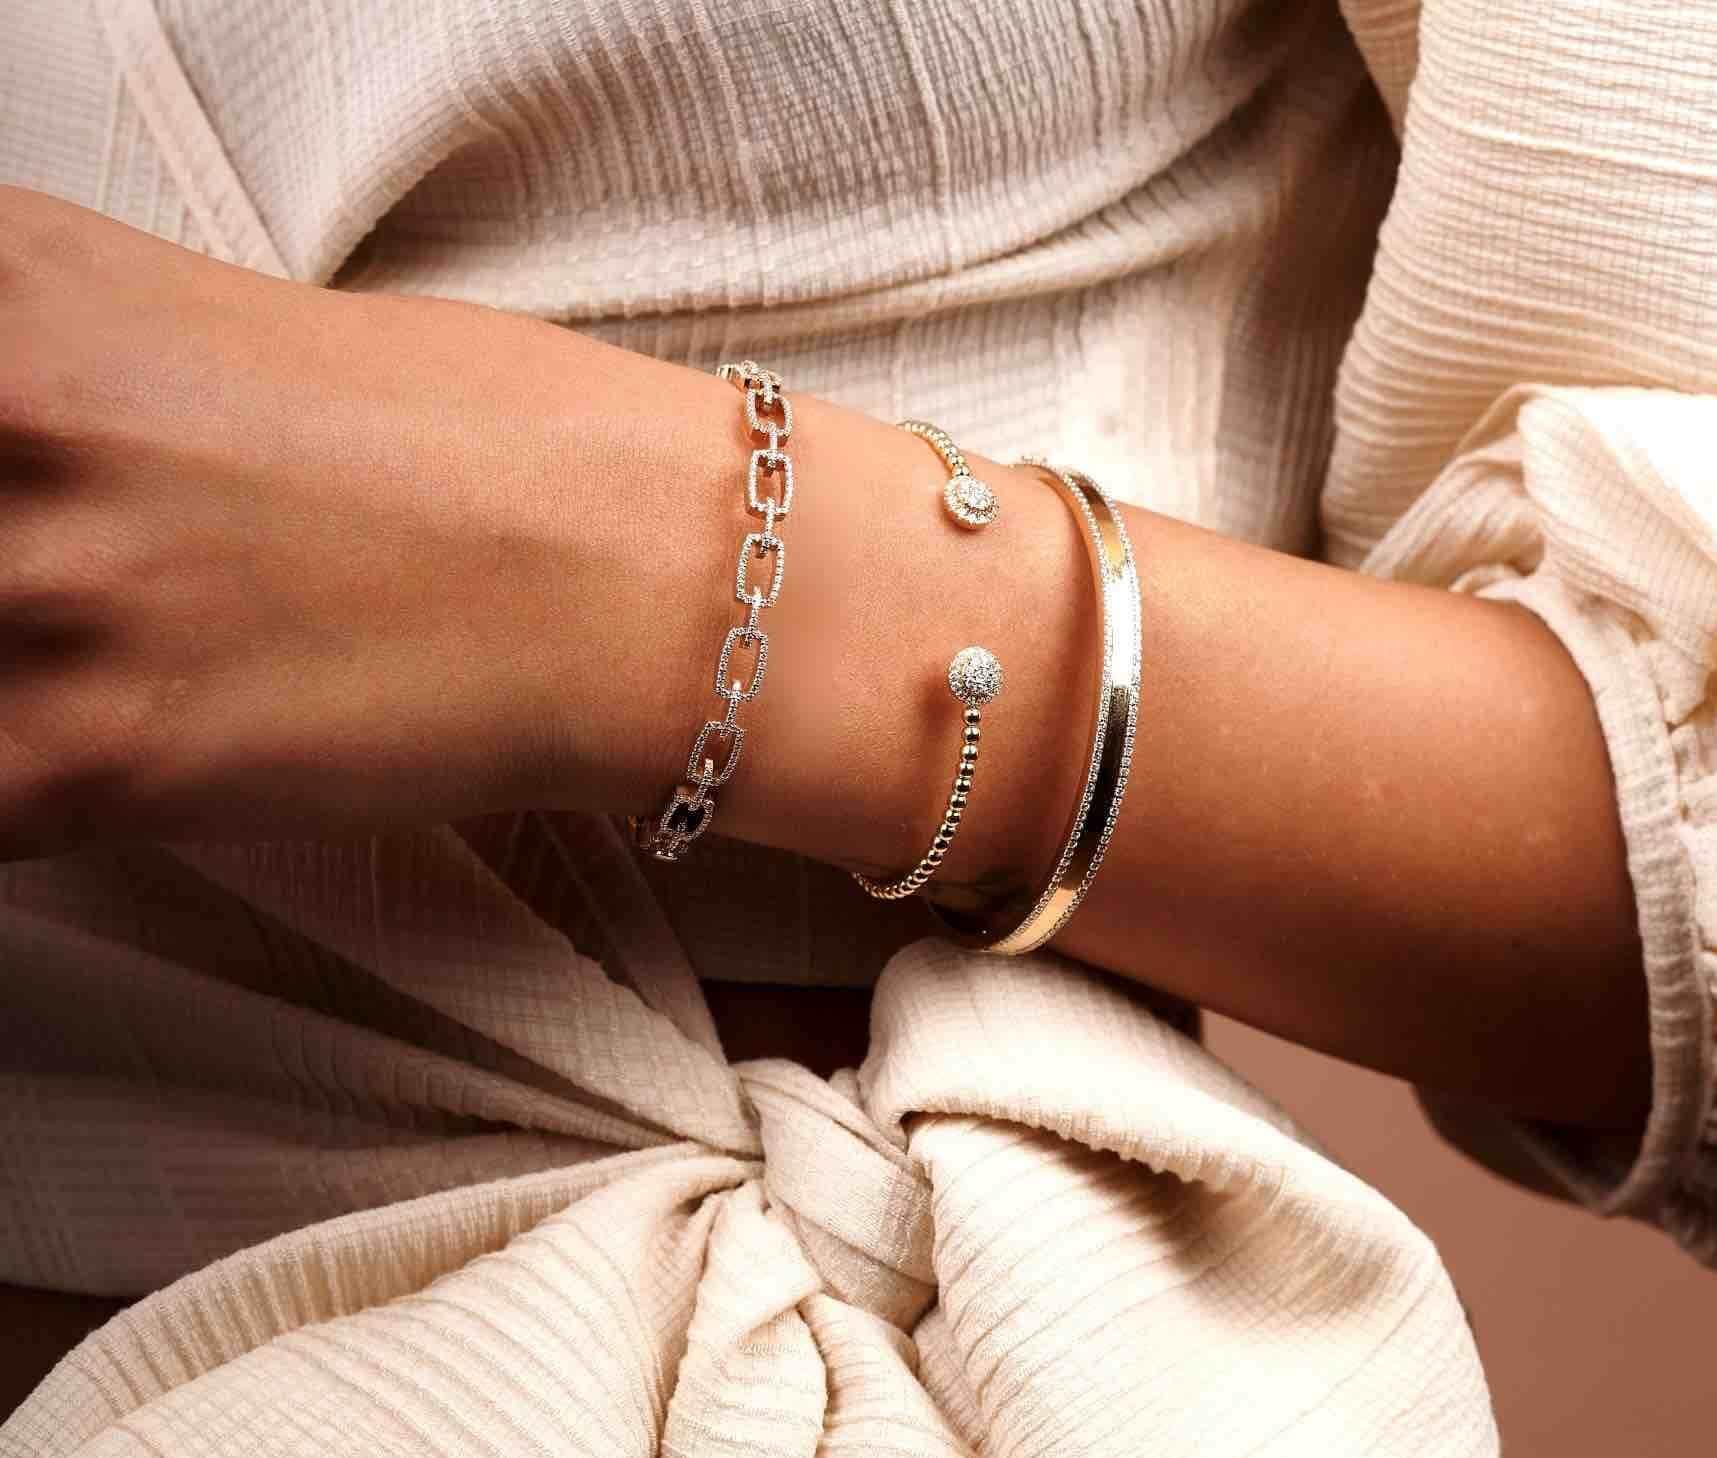 دليل هدايا مجوهرات aquae jewels الخاص بشهر رمضان المبارك